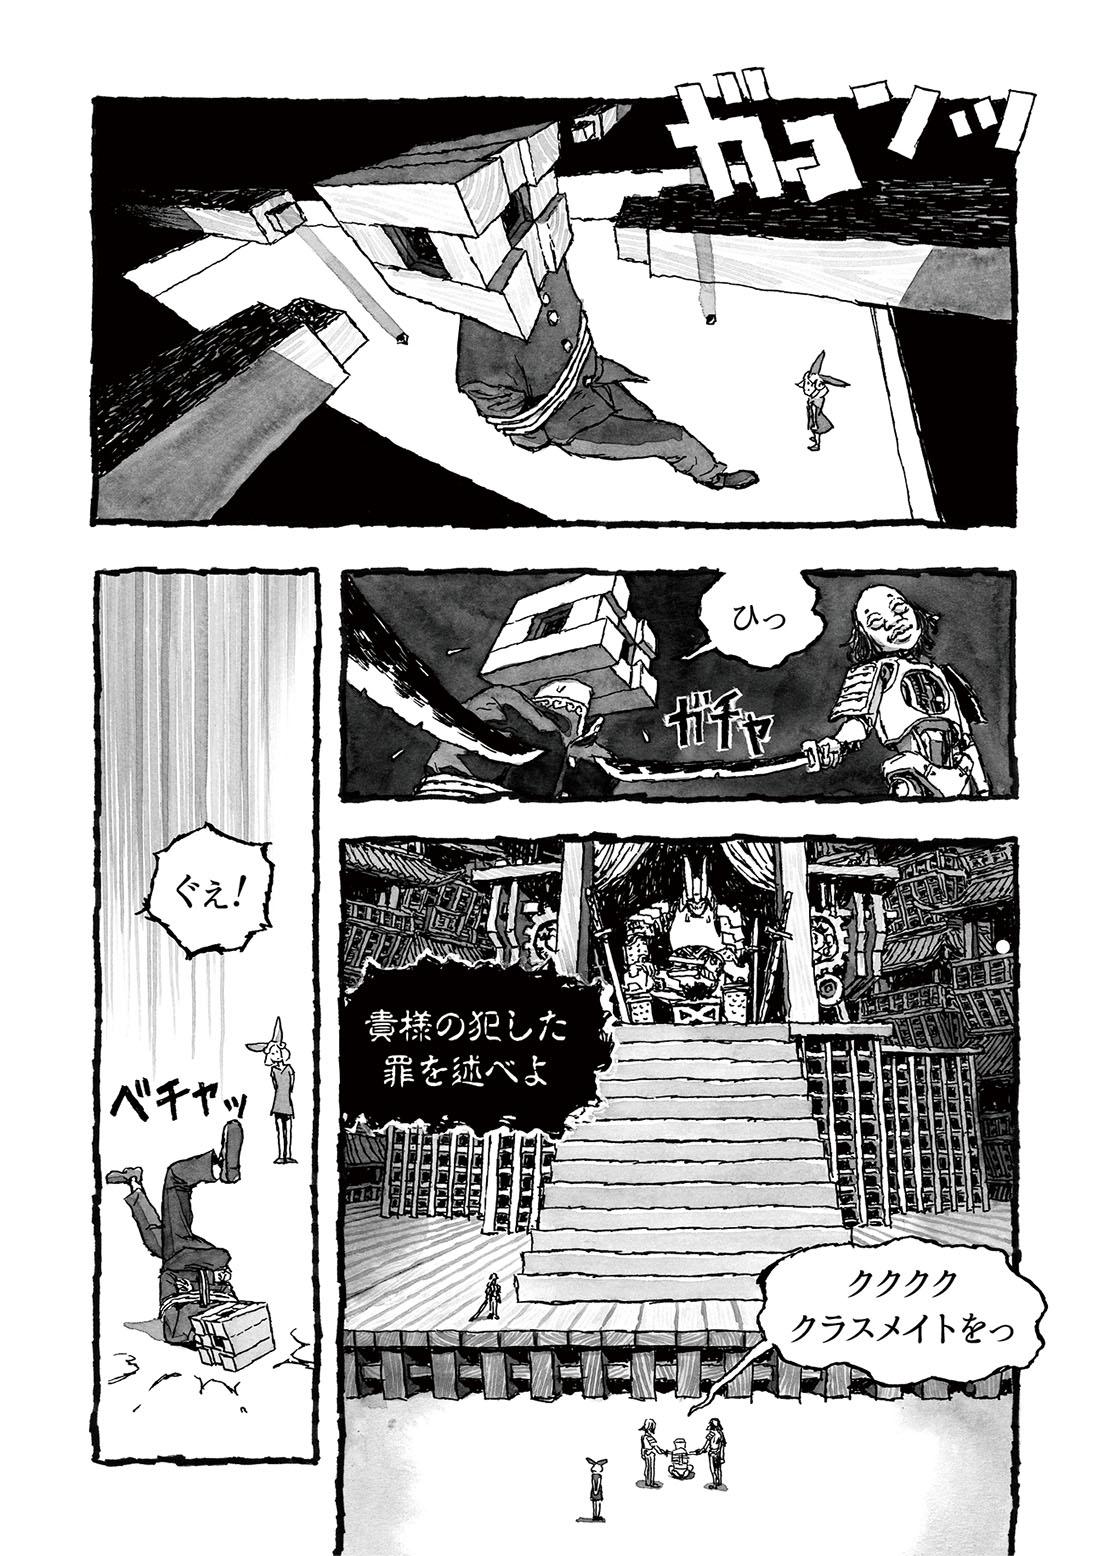 長編漫画「BIBLIOMANIA」連載 第2話「430号室の審判」2P